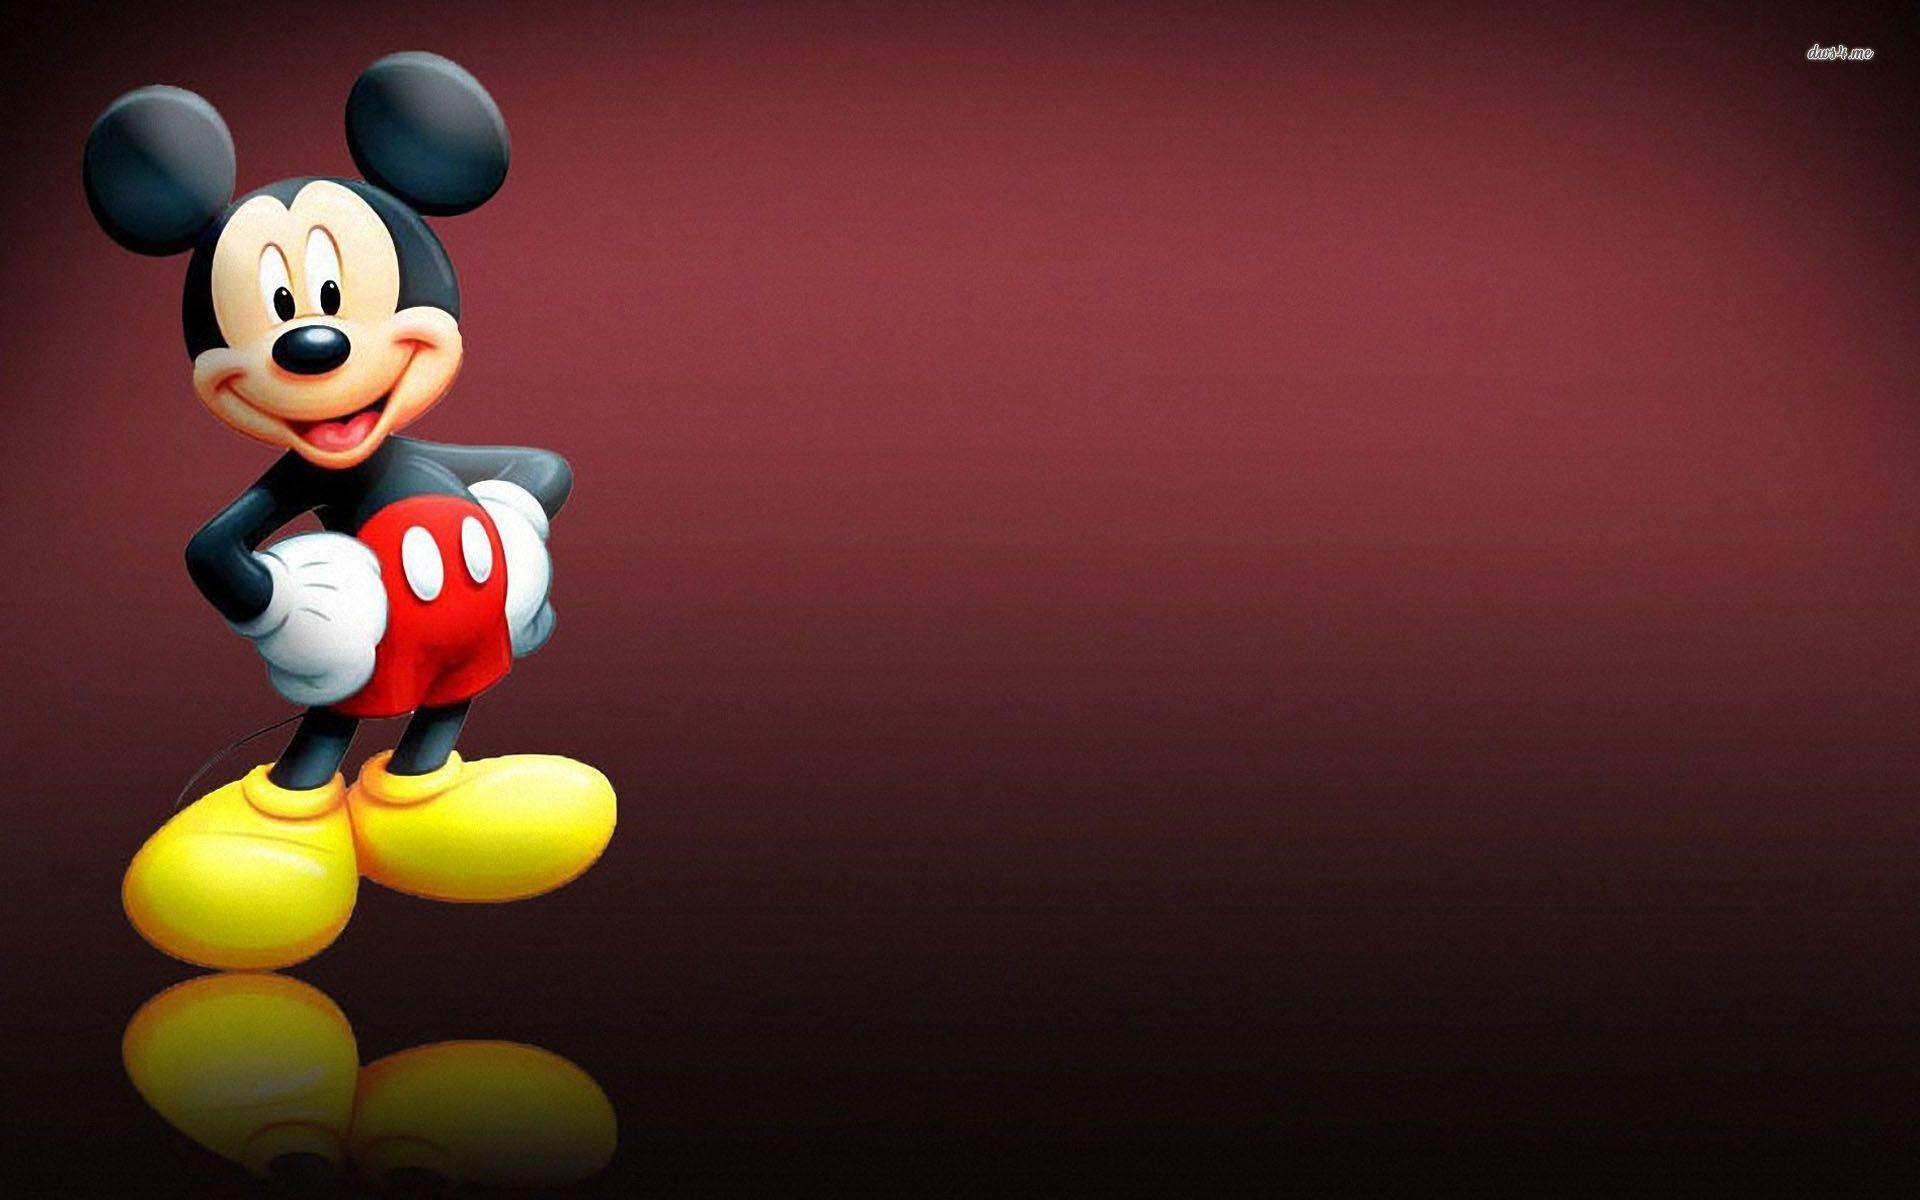 Mickey Mouse Wallpaper Desktop